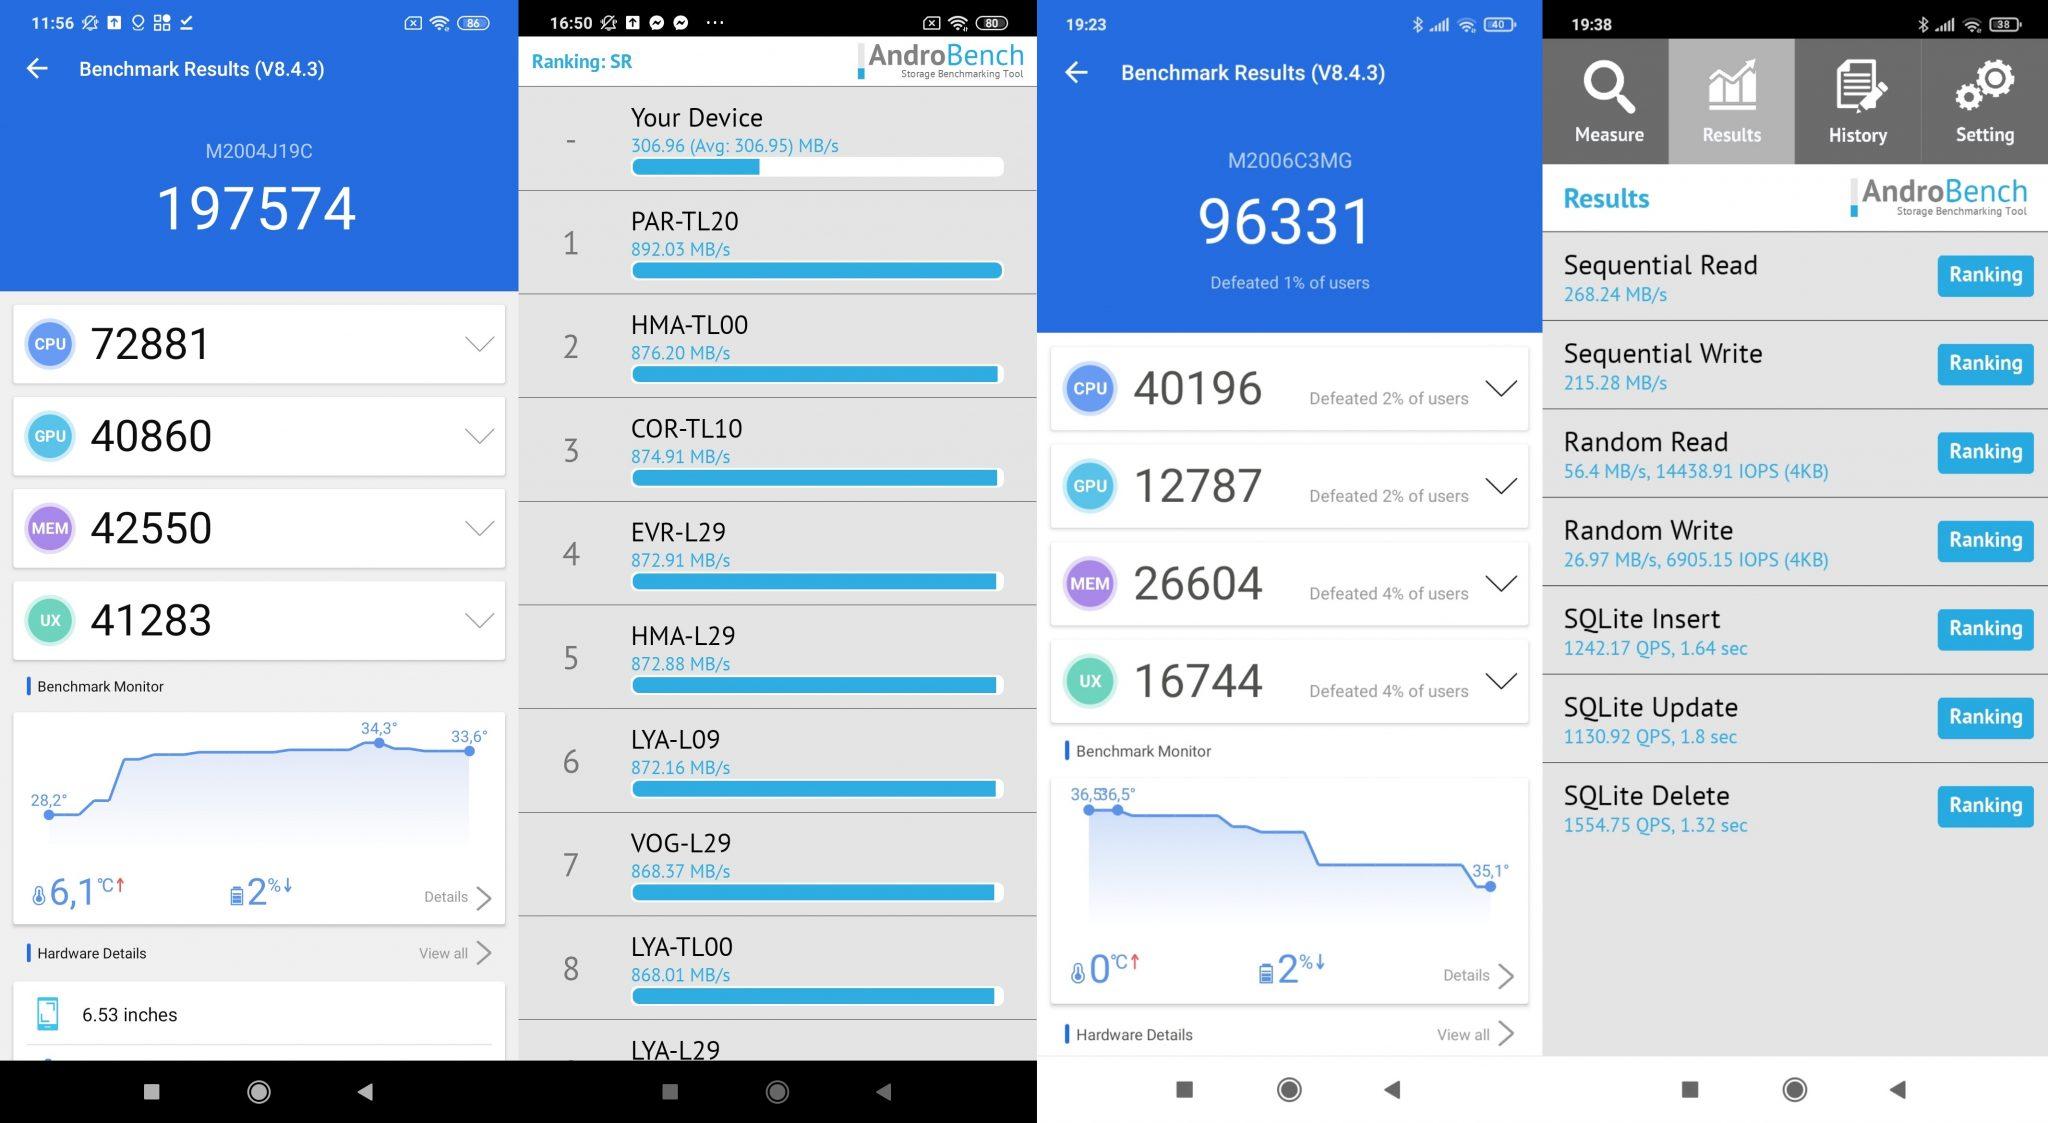 Redmi 9 vs. Redmi 9C okostelefon teszt 18